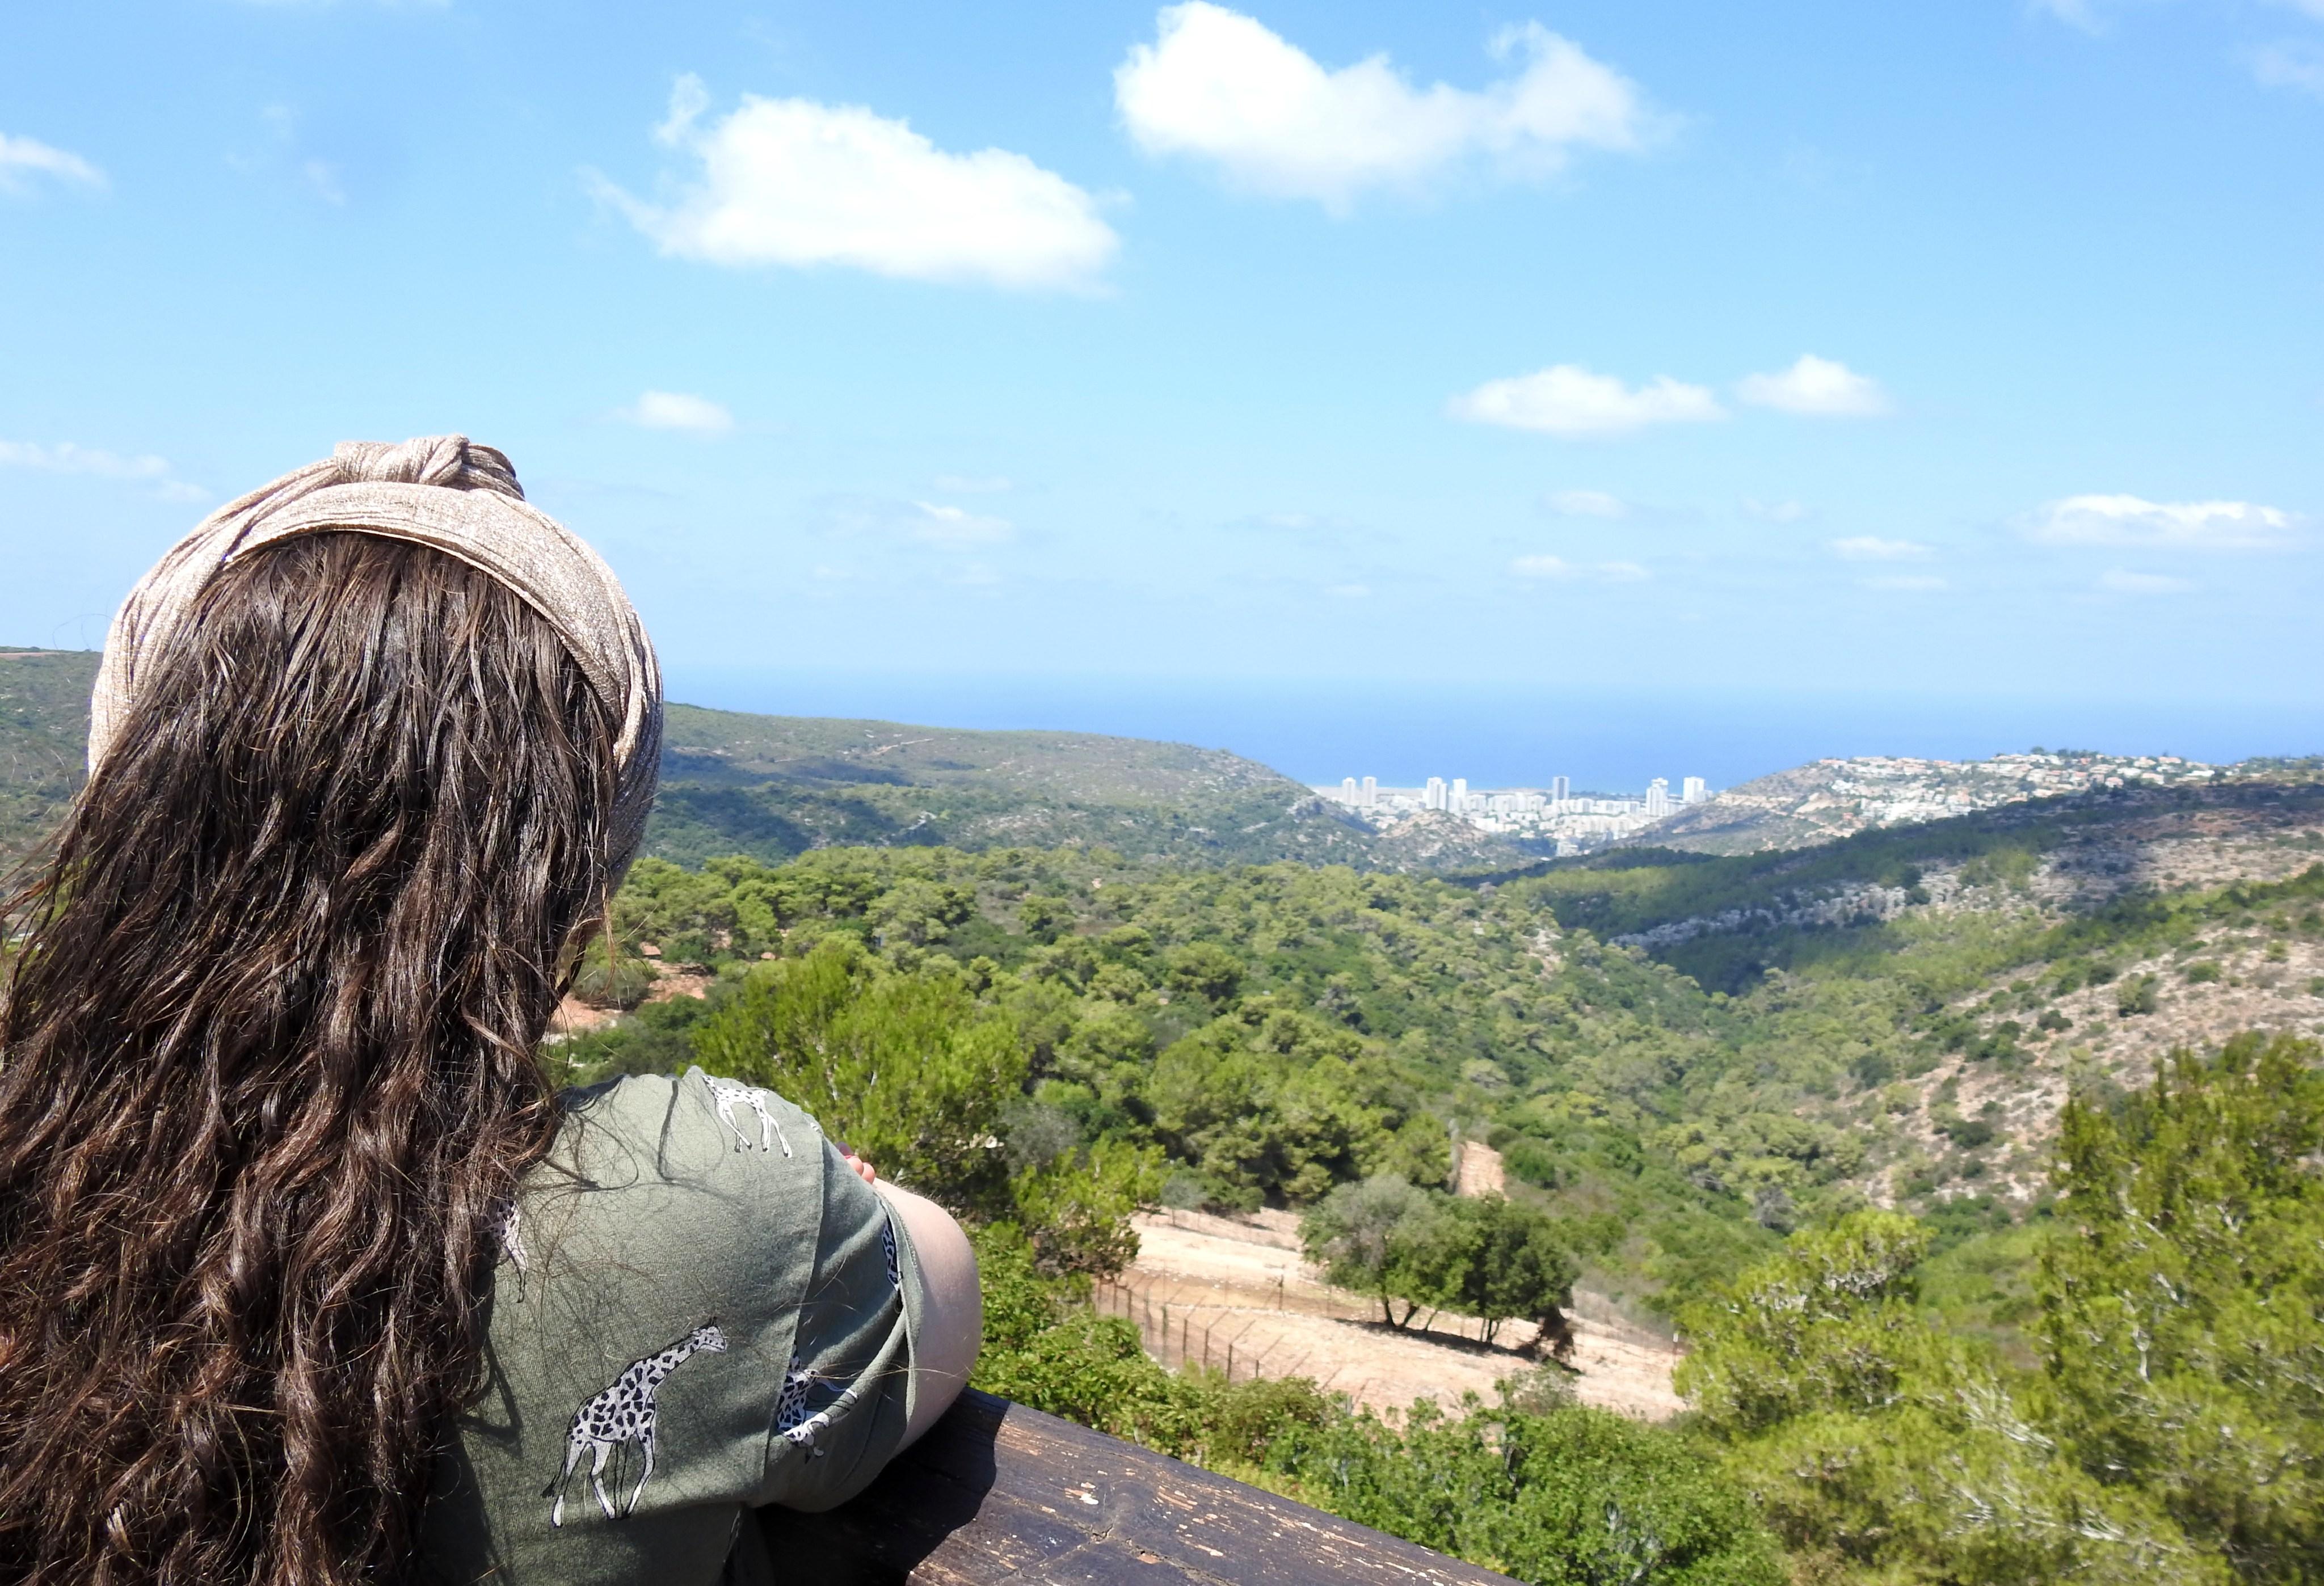 Bracha taking in the view